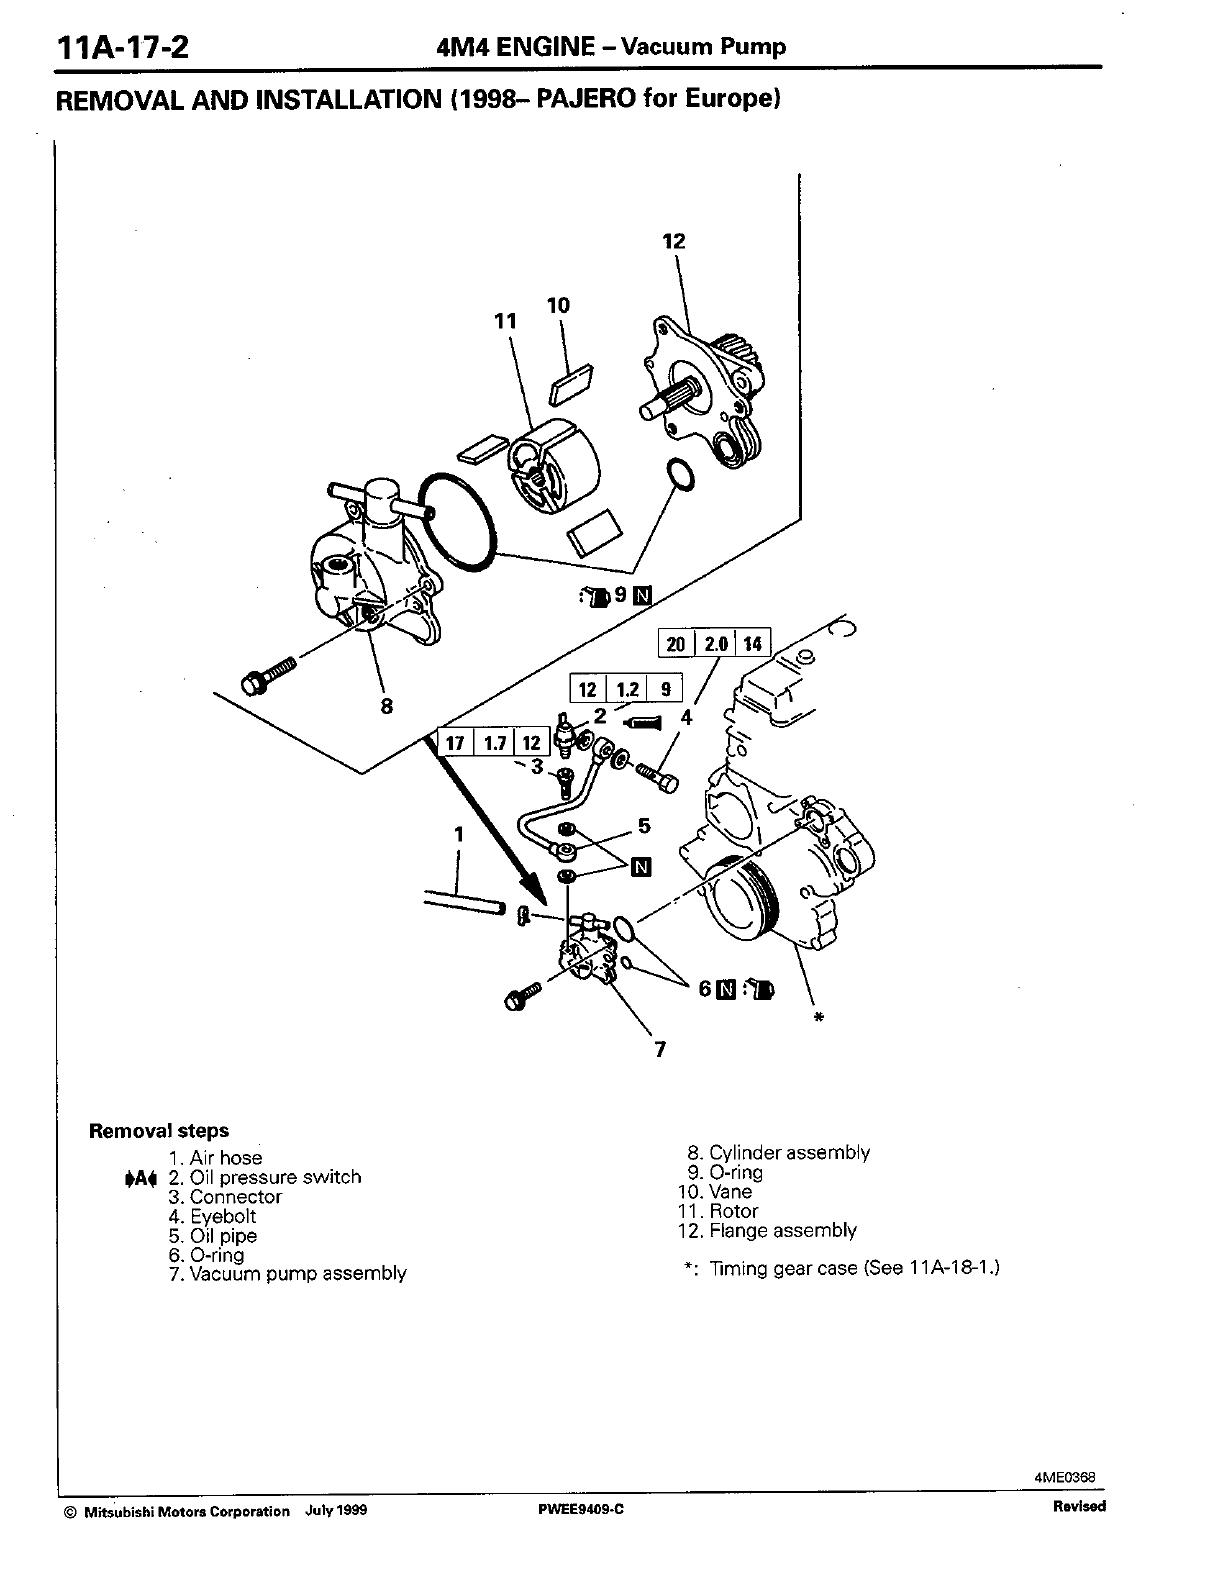 ENGINE Workshop Manual 4M4 (W E) 4M40